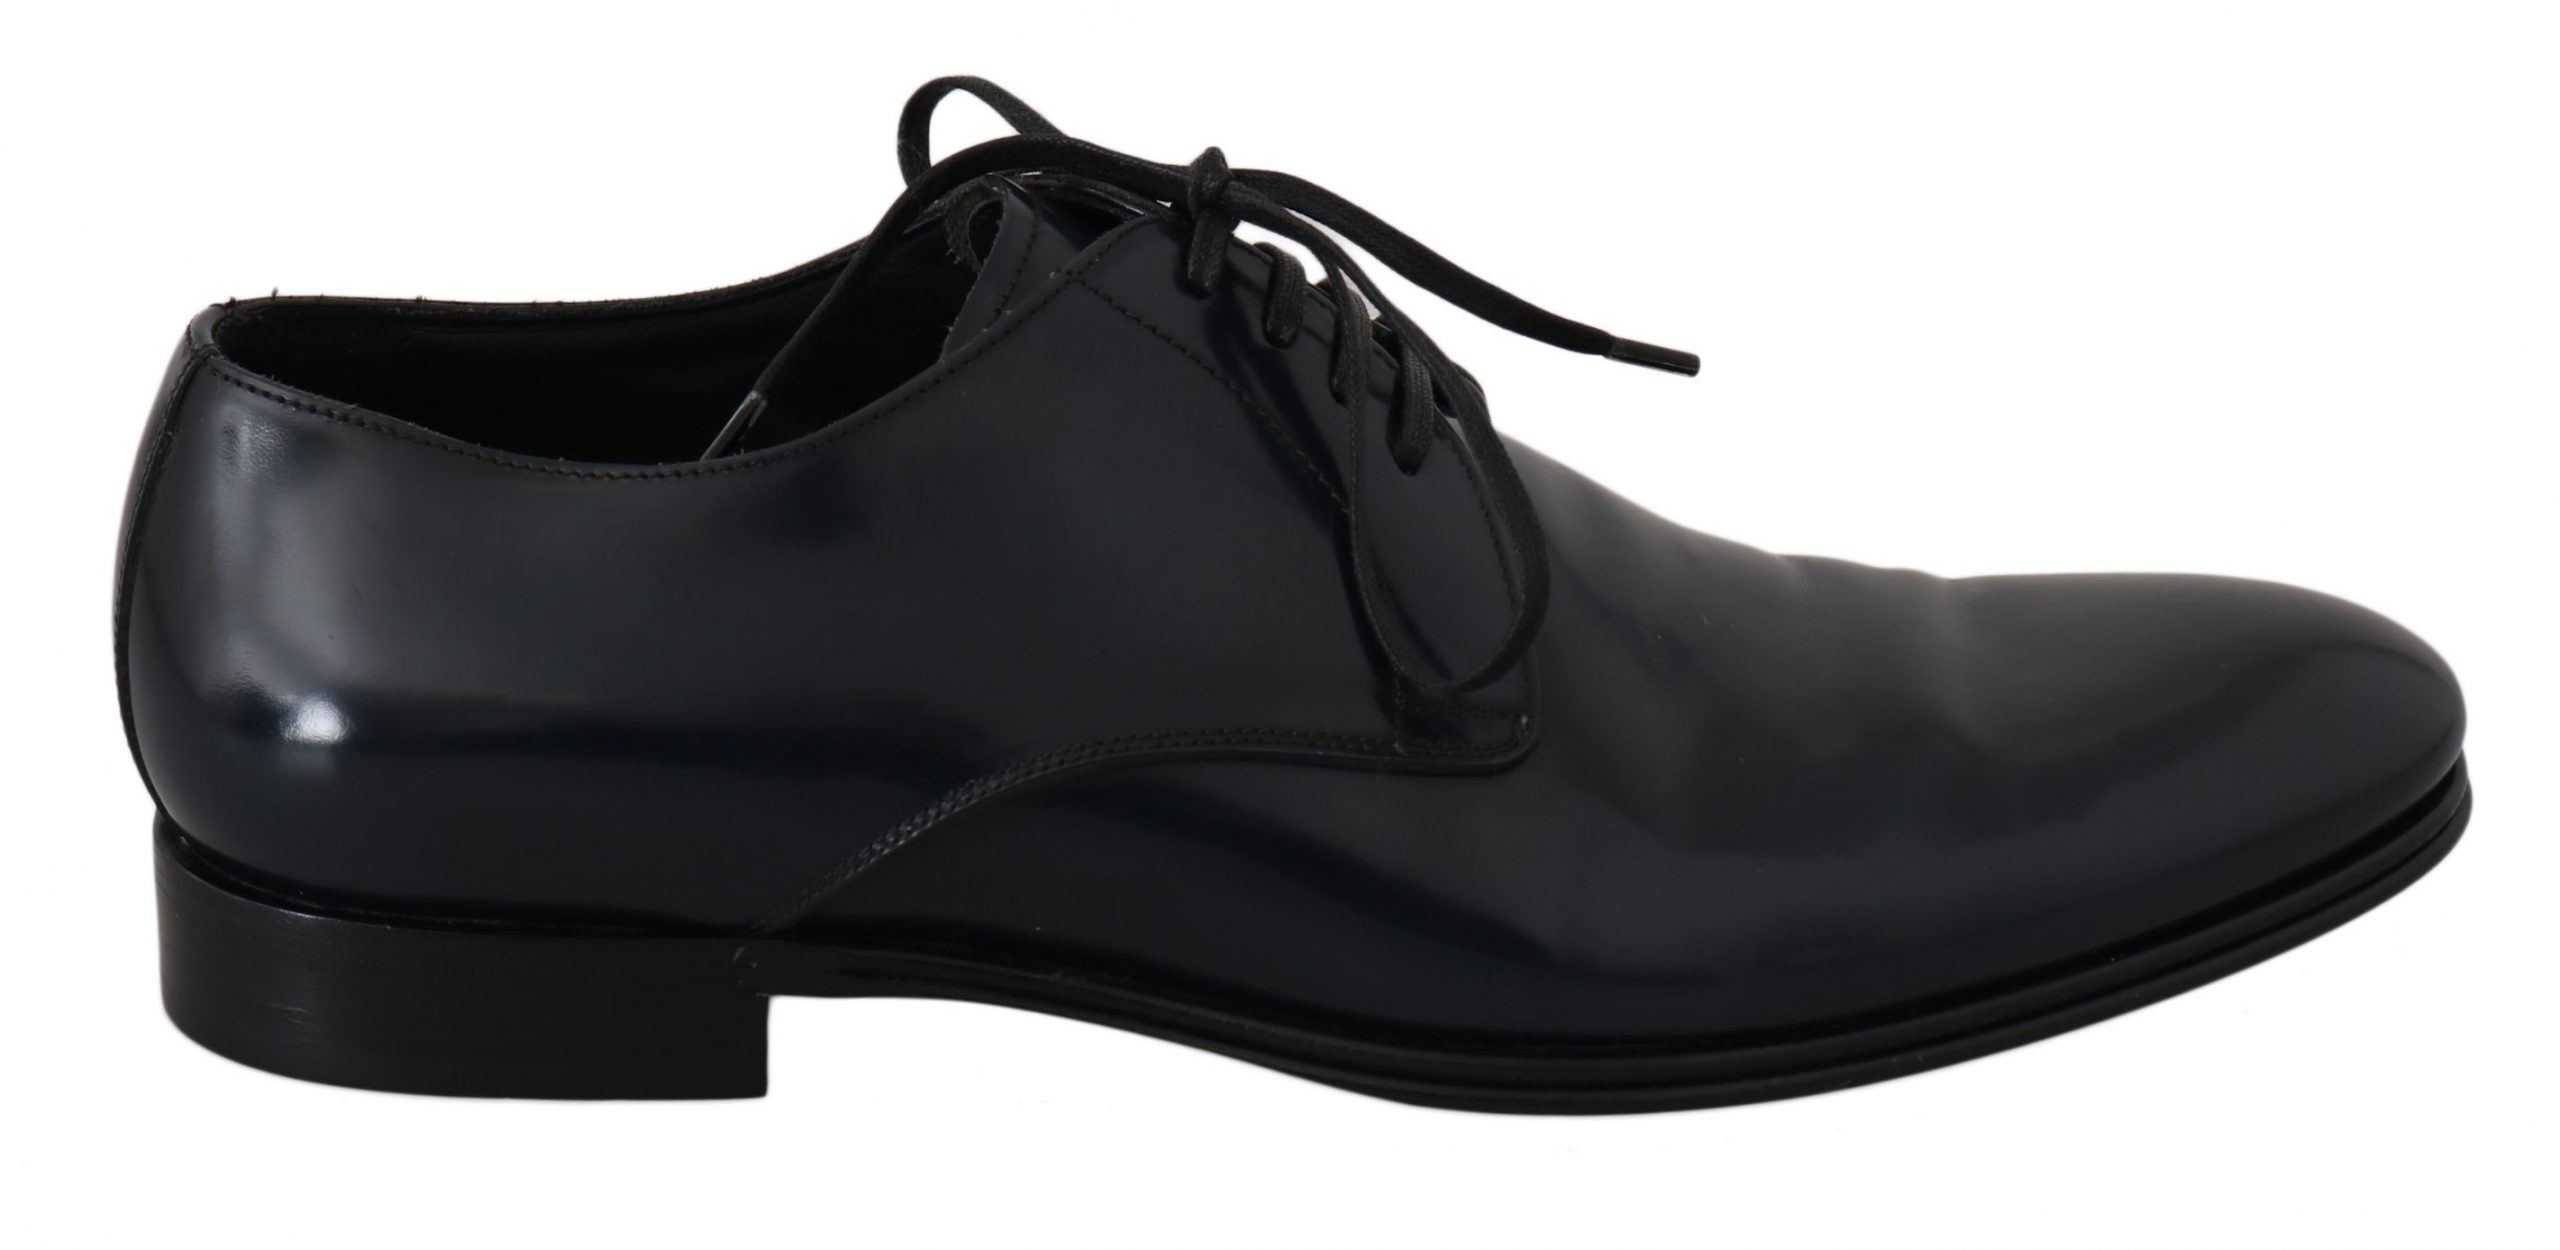 Dolce & Gabbana Men's Shoes Blue MV2340 - EU39/US6